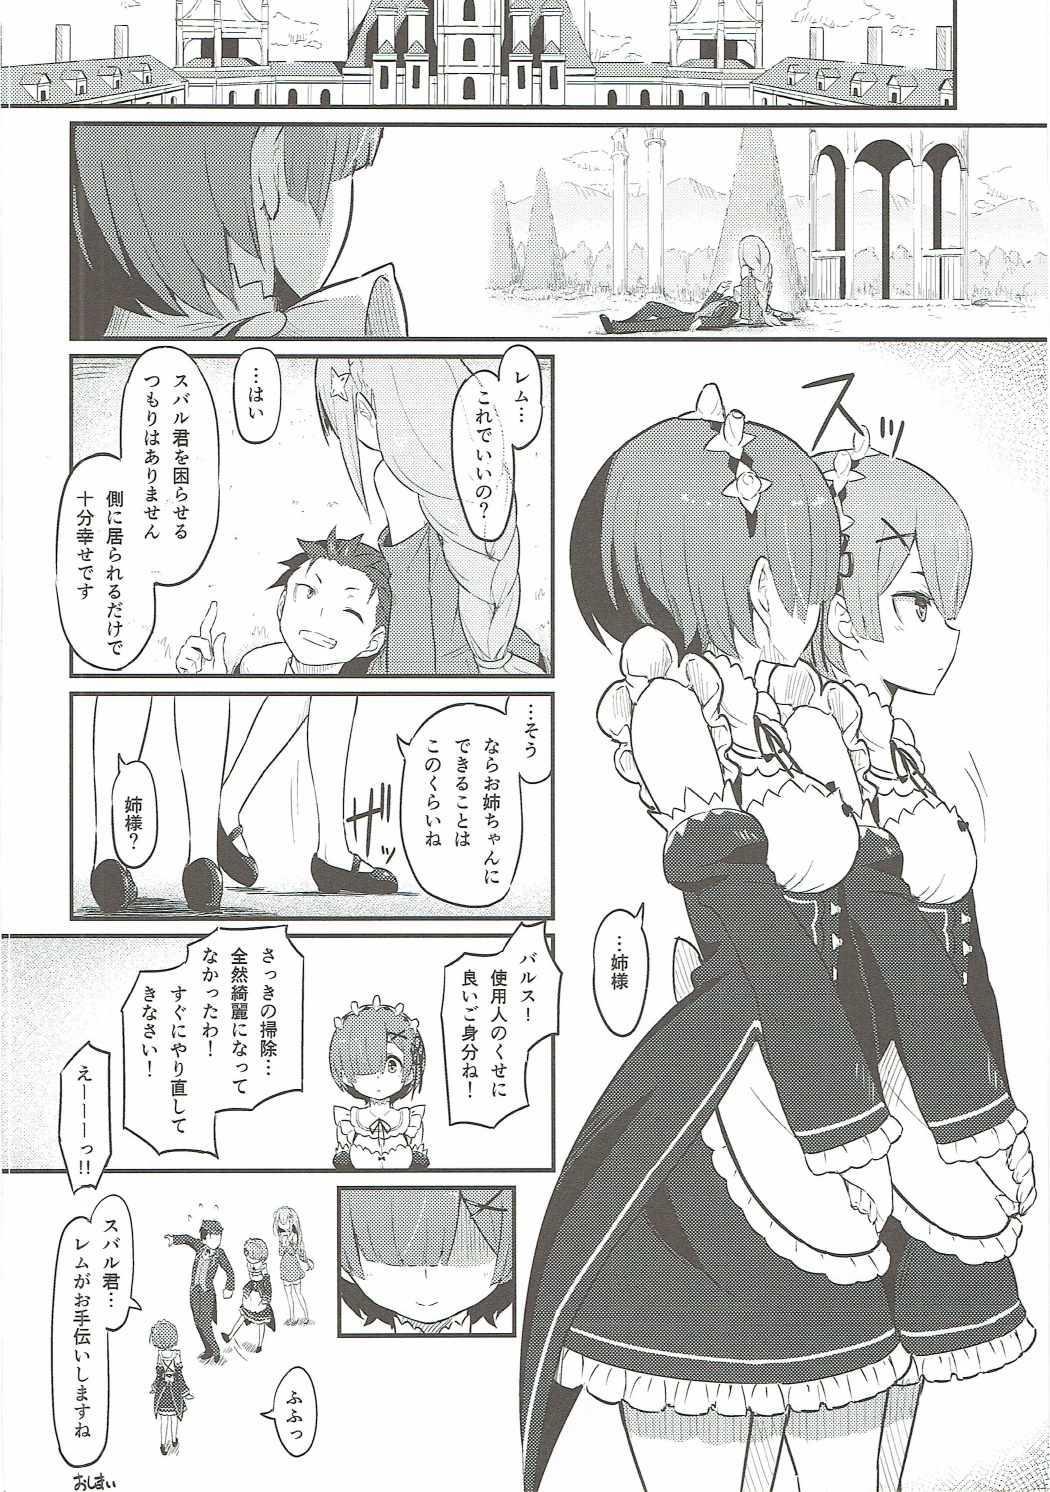 Rem no Emilia Kuttsuke Daisakusen 24